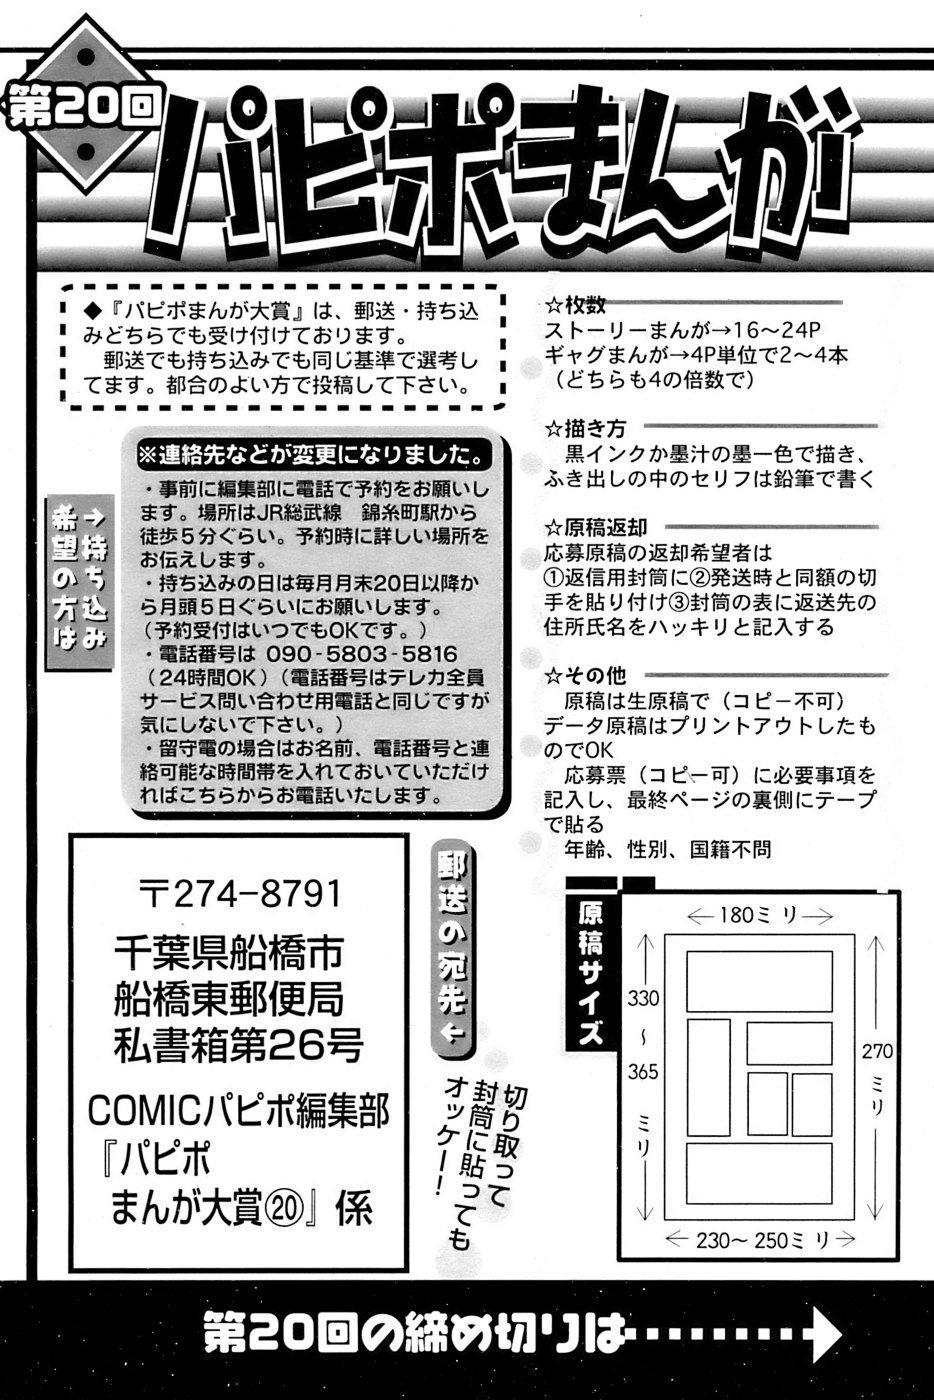 Comic Papipo 2007-04 234